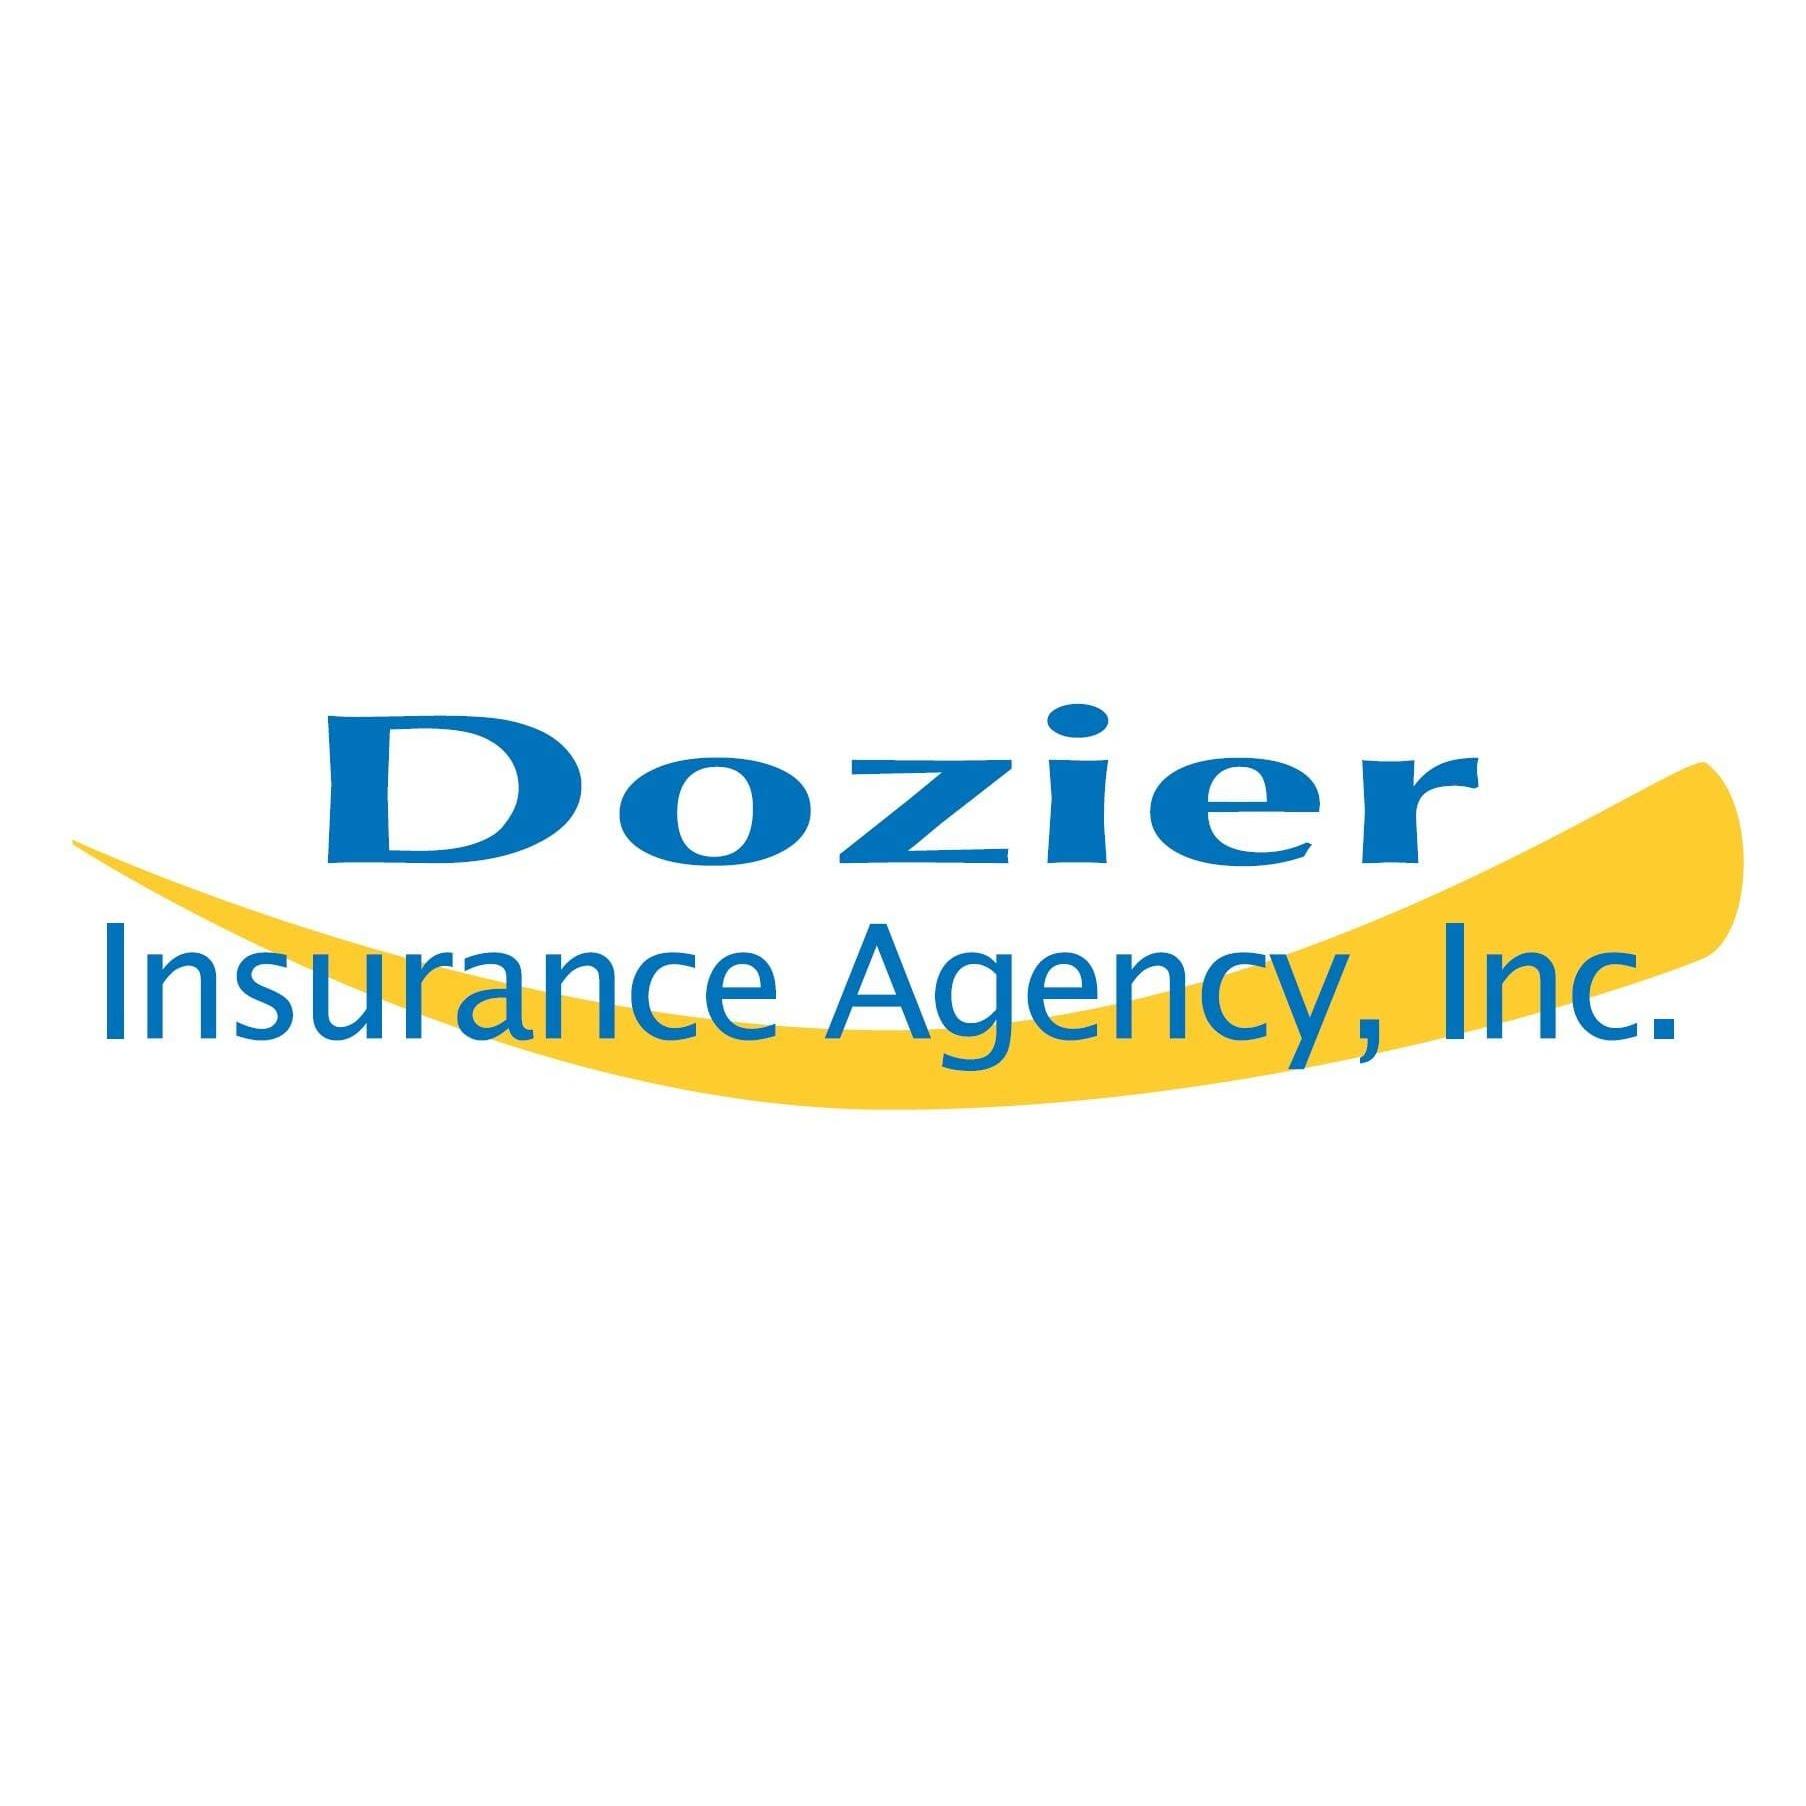 Dozier Insurance Agency, Inc.